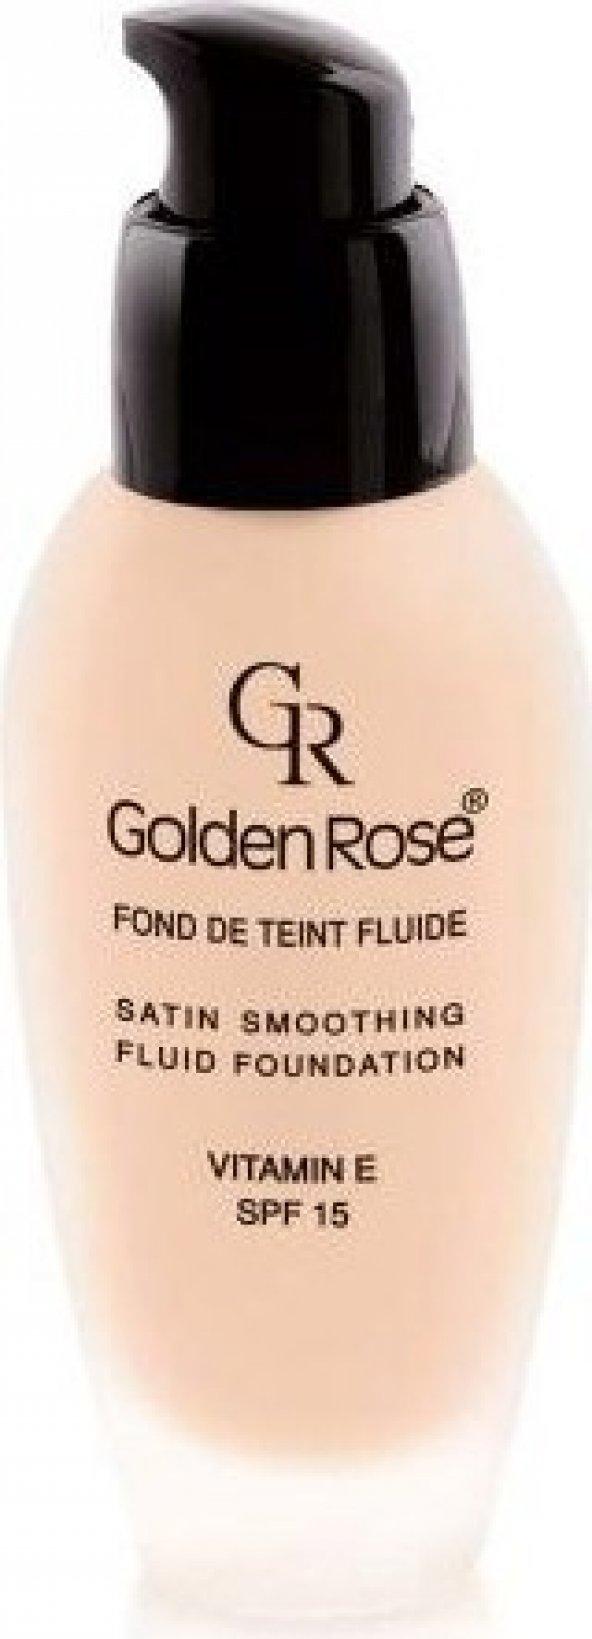 Golden Rose Satin Smoothing Fluid Foundation - Fondöten - 27